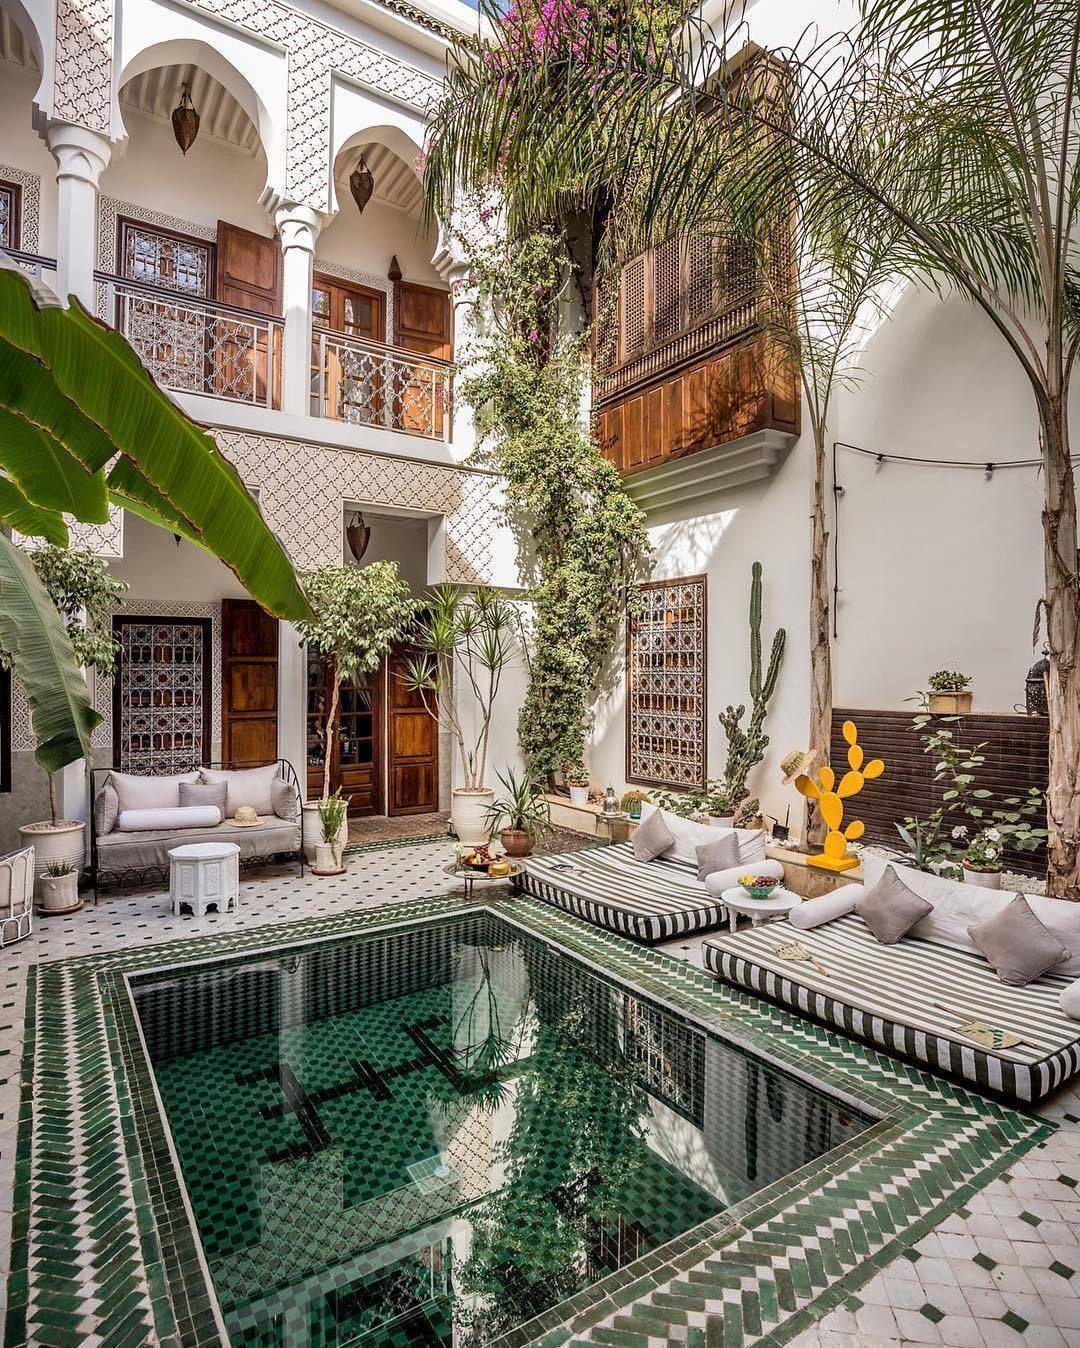 23 2 M Gostos 148 Comentarios Interior Design Decor Homeadore No Instagram Hotel Boutique Riad Yasmine Maison Maroc Le Riad Maison Design